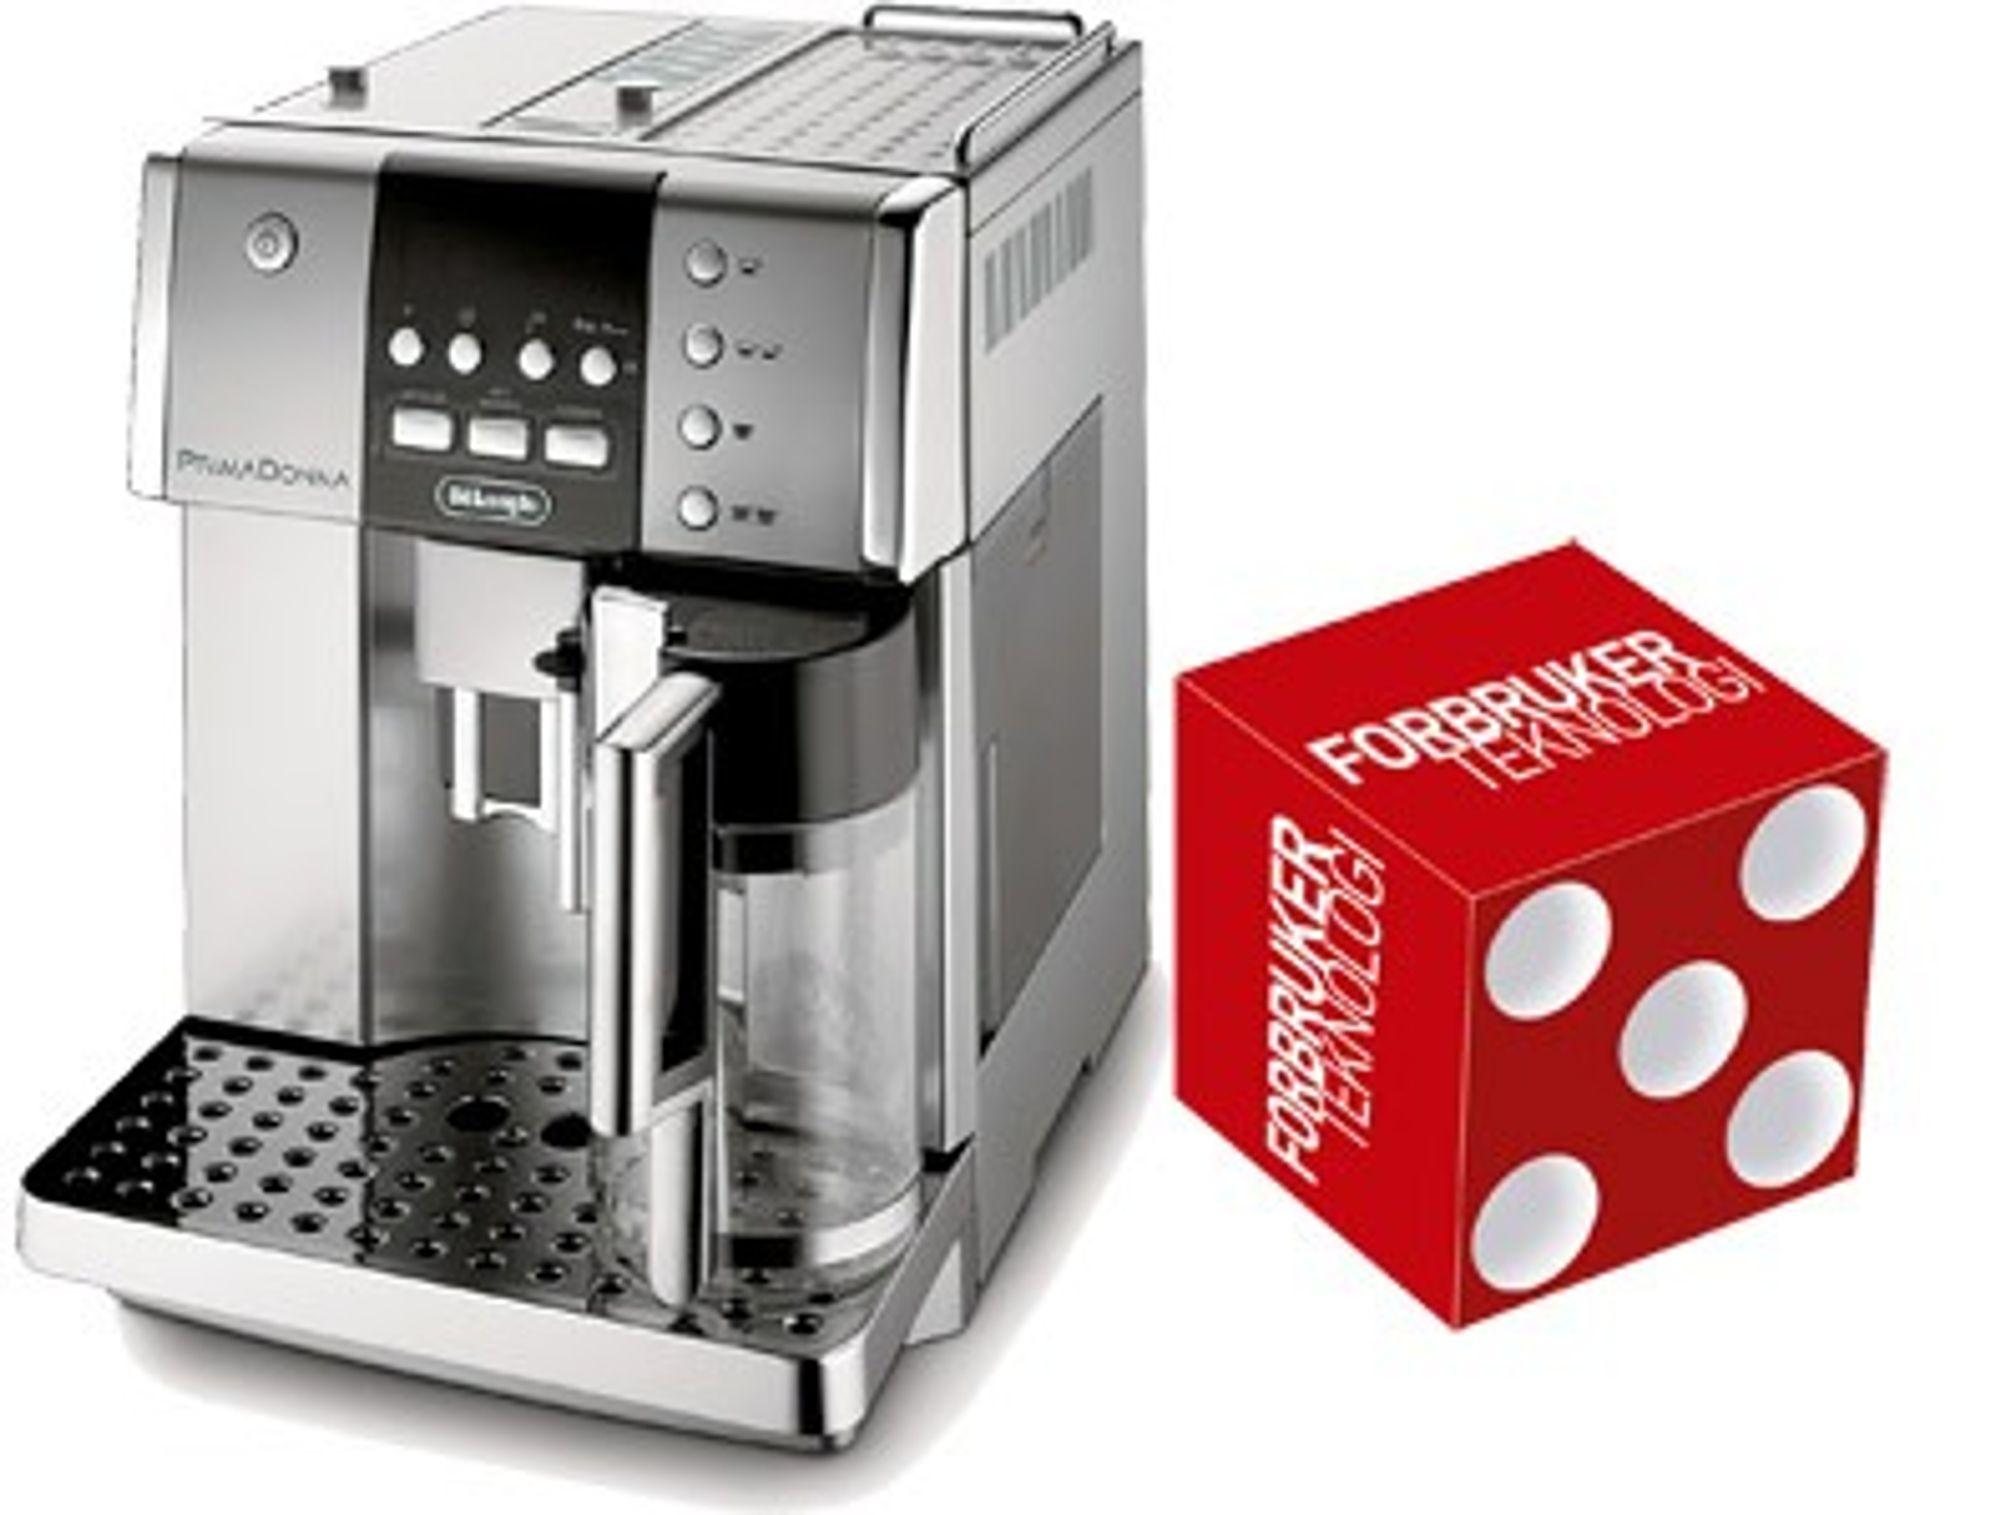 Helautomatisk kaffemaskin best i test